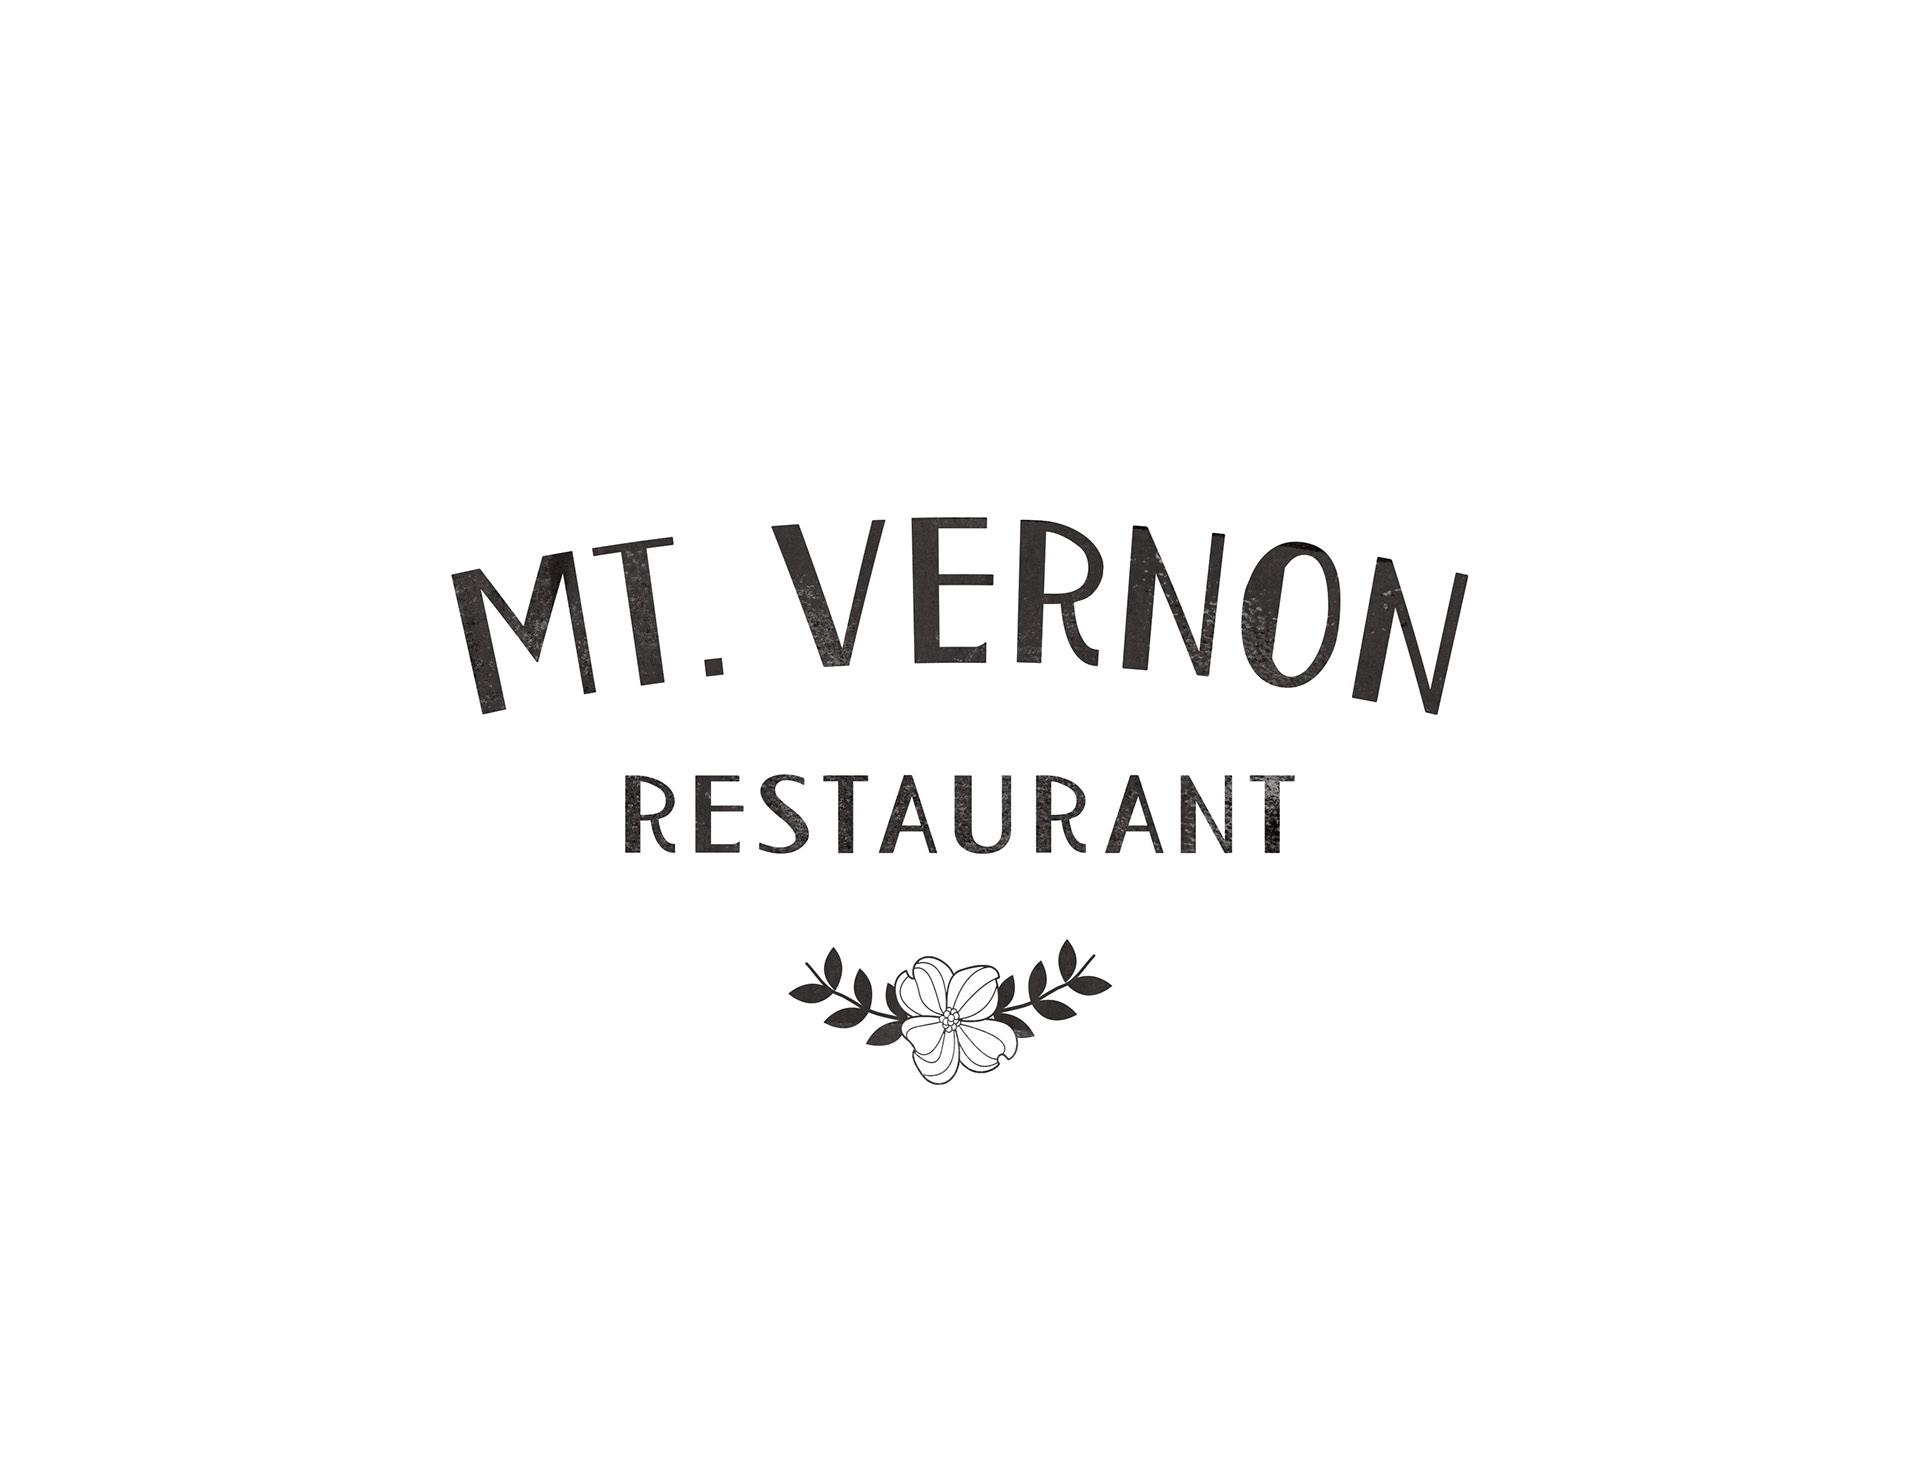 Justin Ford The Mt Vernon Restaurant